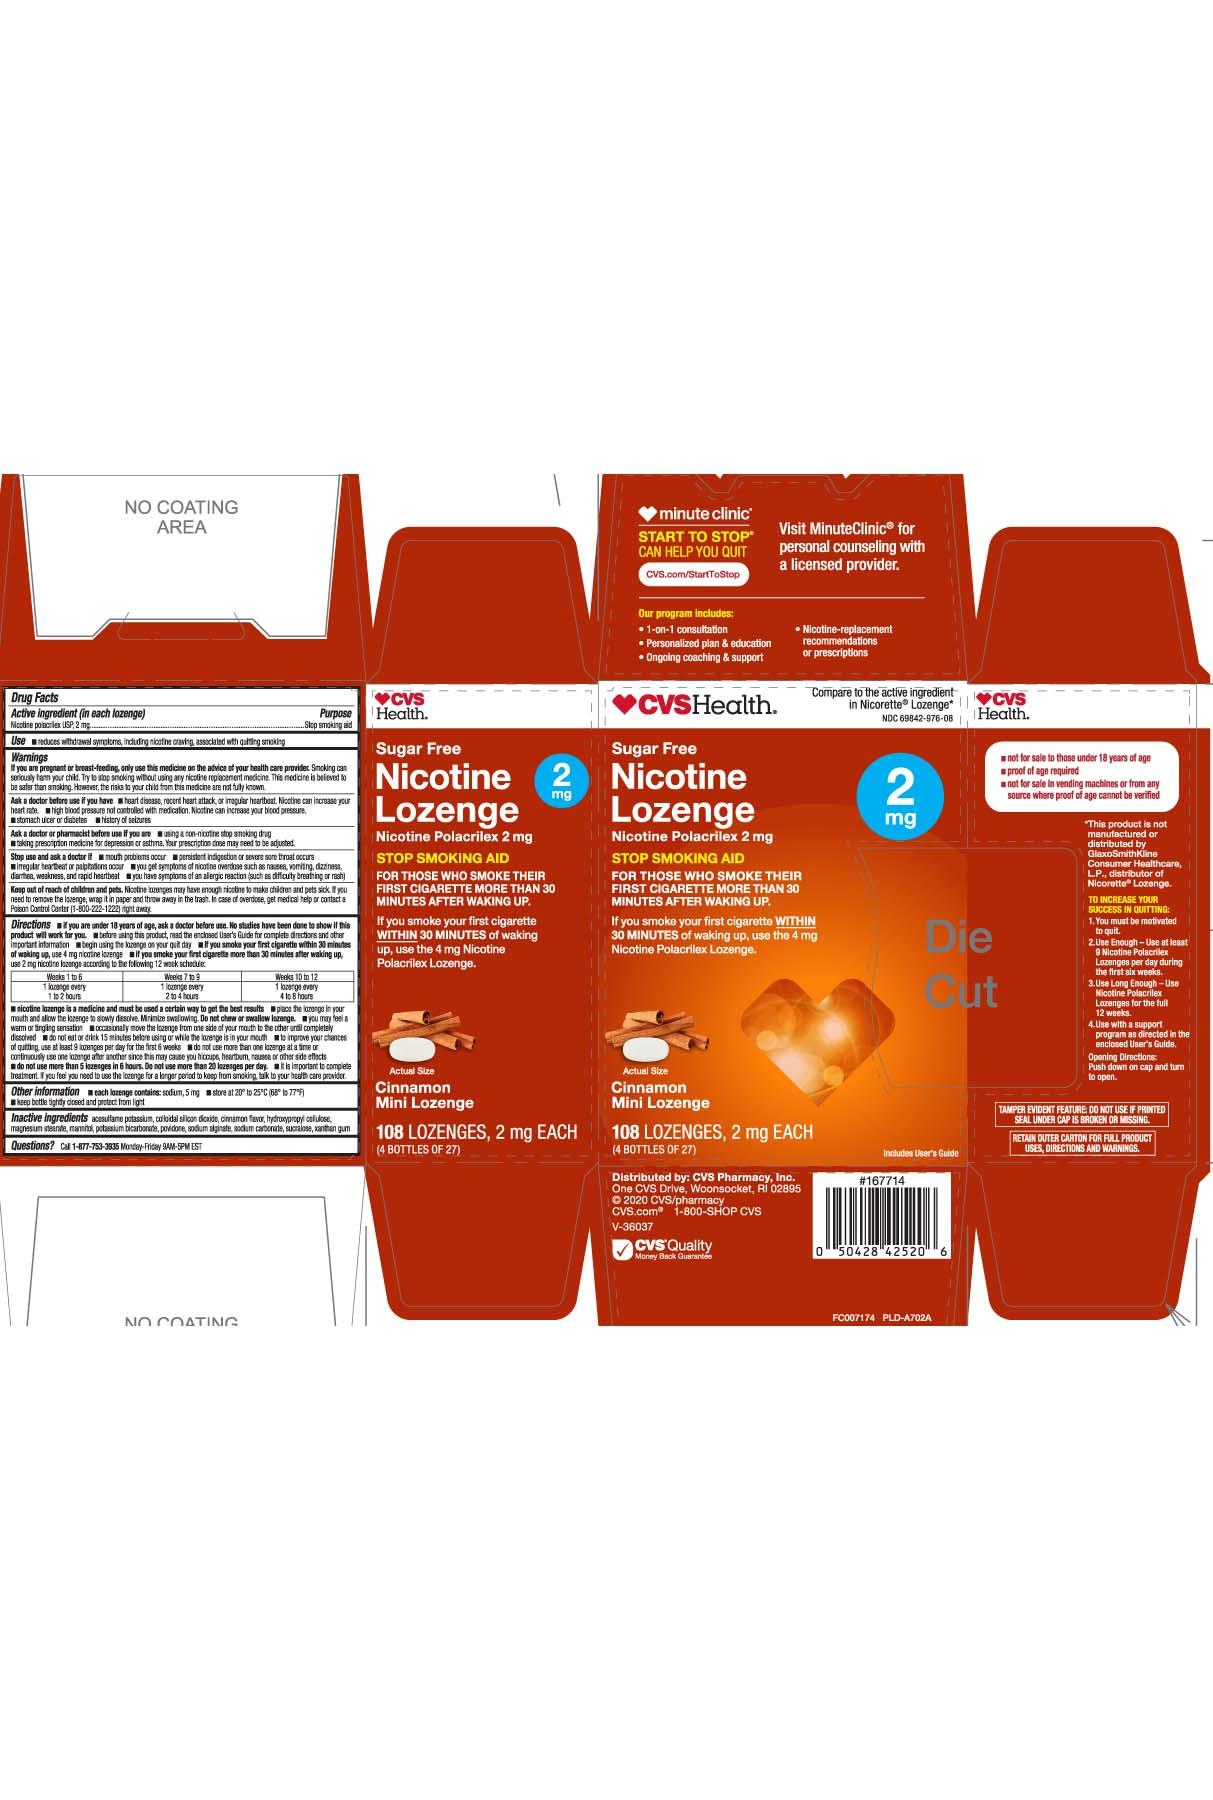 Nicotine polacrilex 2 mg